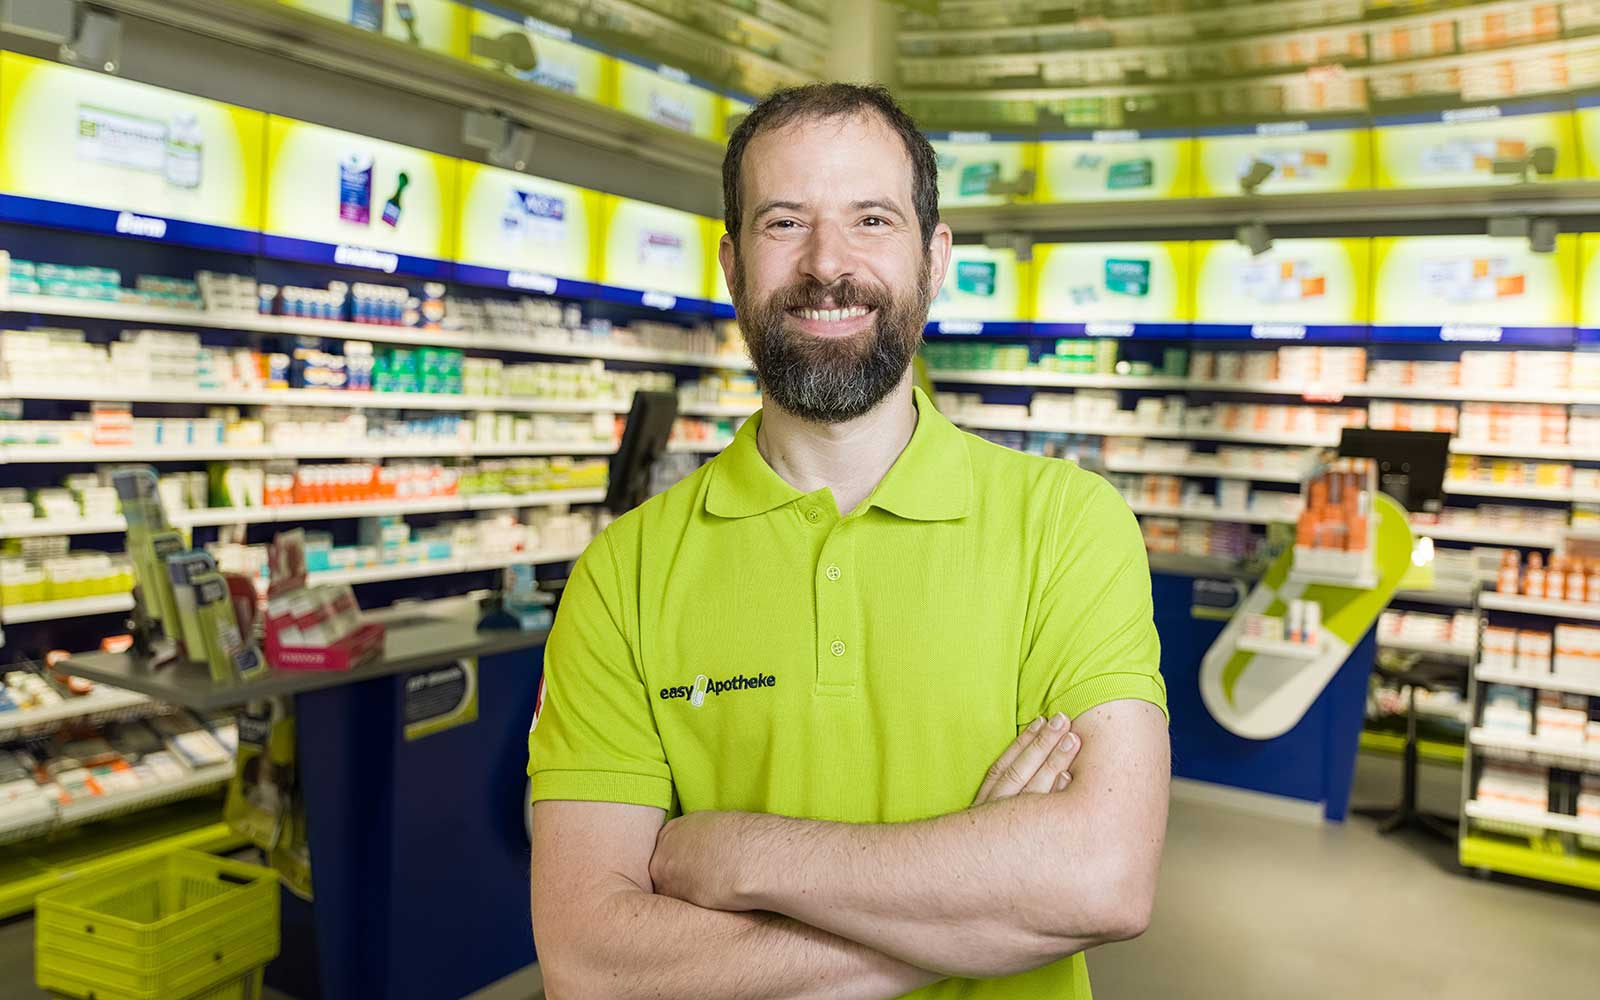 Apotheker Peter Dorfner in seiner easyApotheke Neumarkt